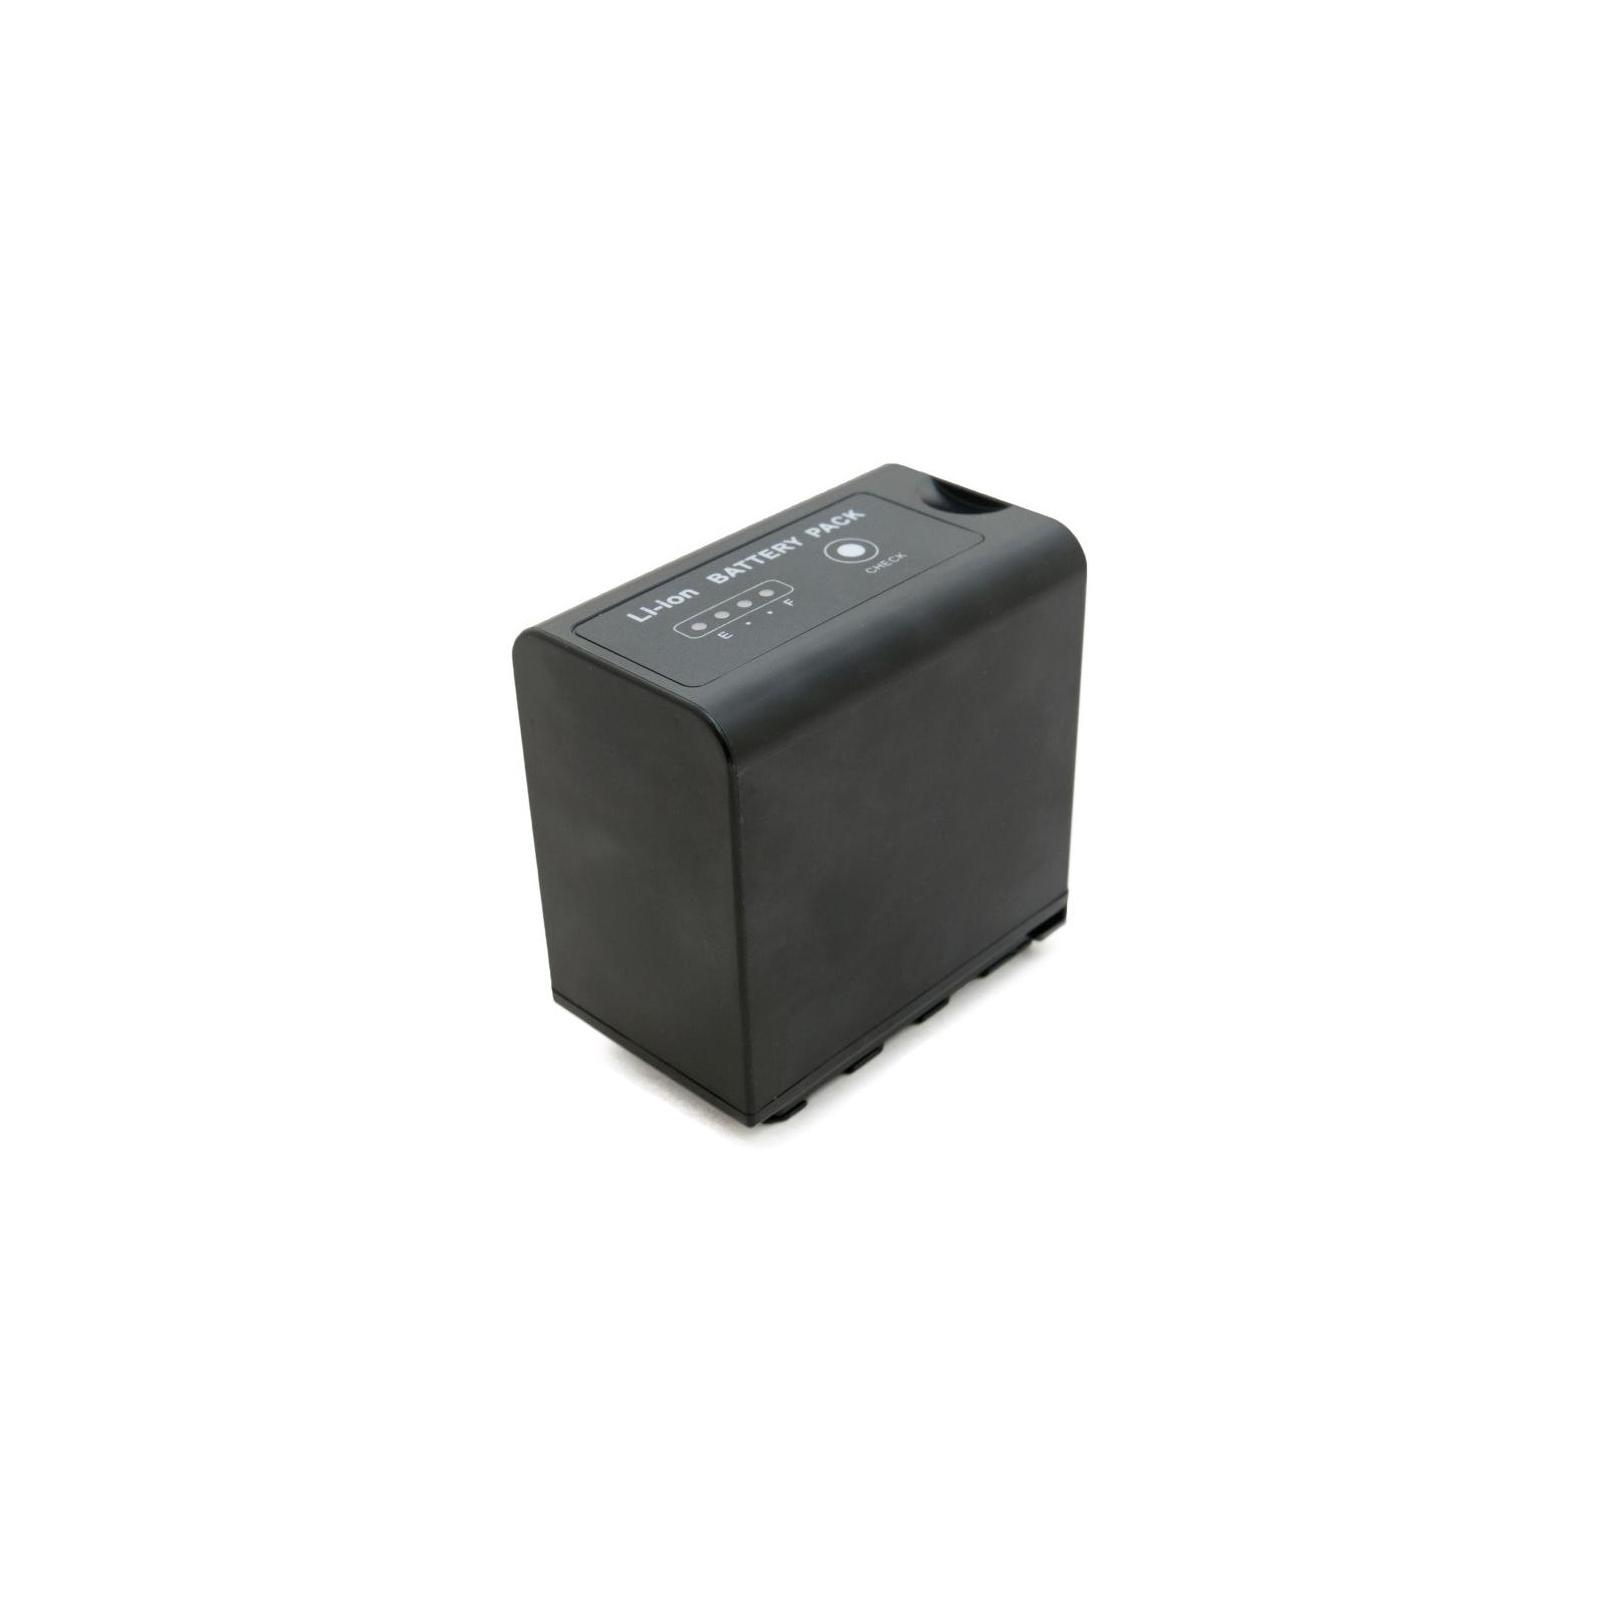 Аккумулятор к фото/видео EXTRADIGITAL Panasonic VW-VBD78, Li-ion, 7.4V, 7800mAh (BDP2694) изображение 5